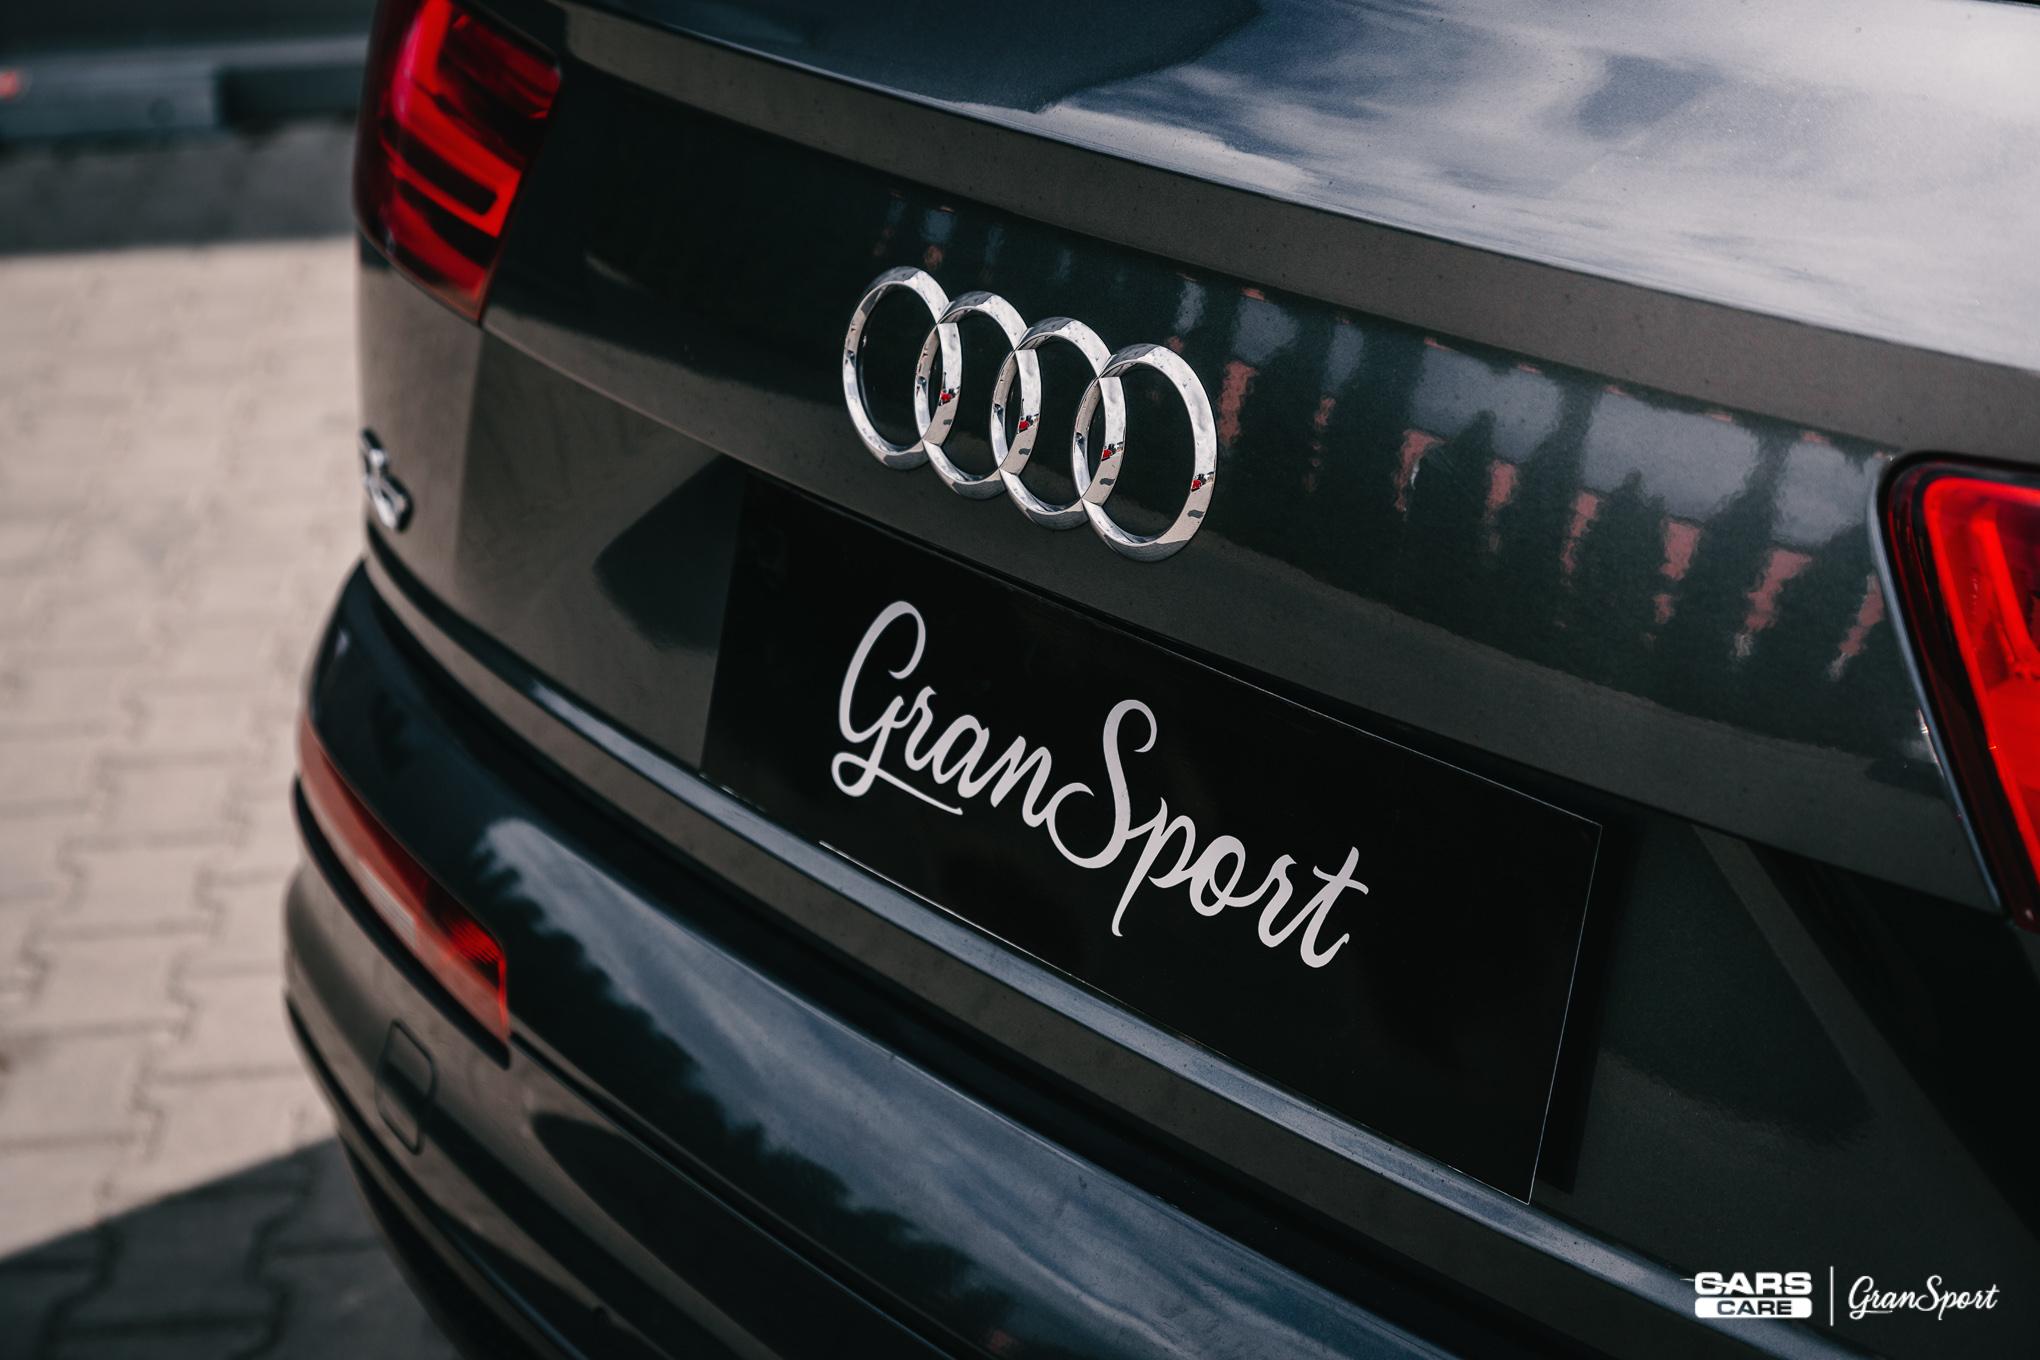 Audi Q7 Maxhaust